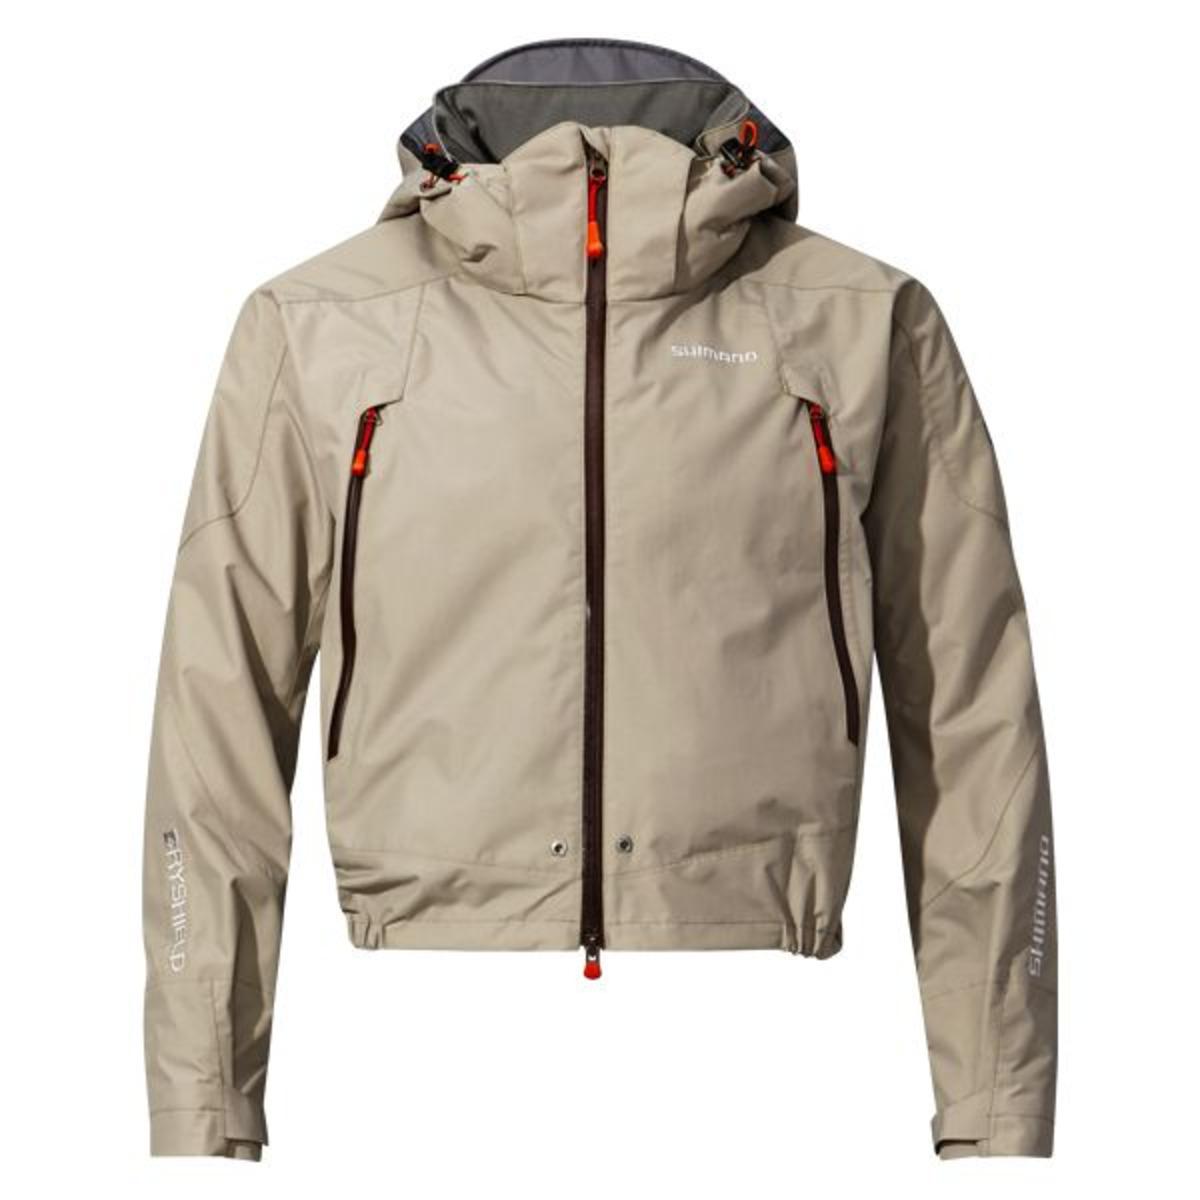 Shimano Jacke Dryshield Advance Short Rain - L - Beige